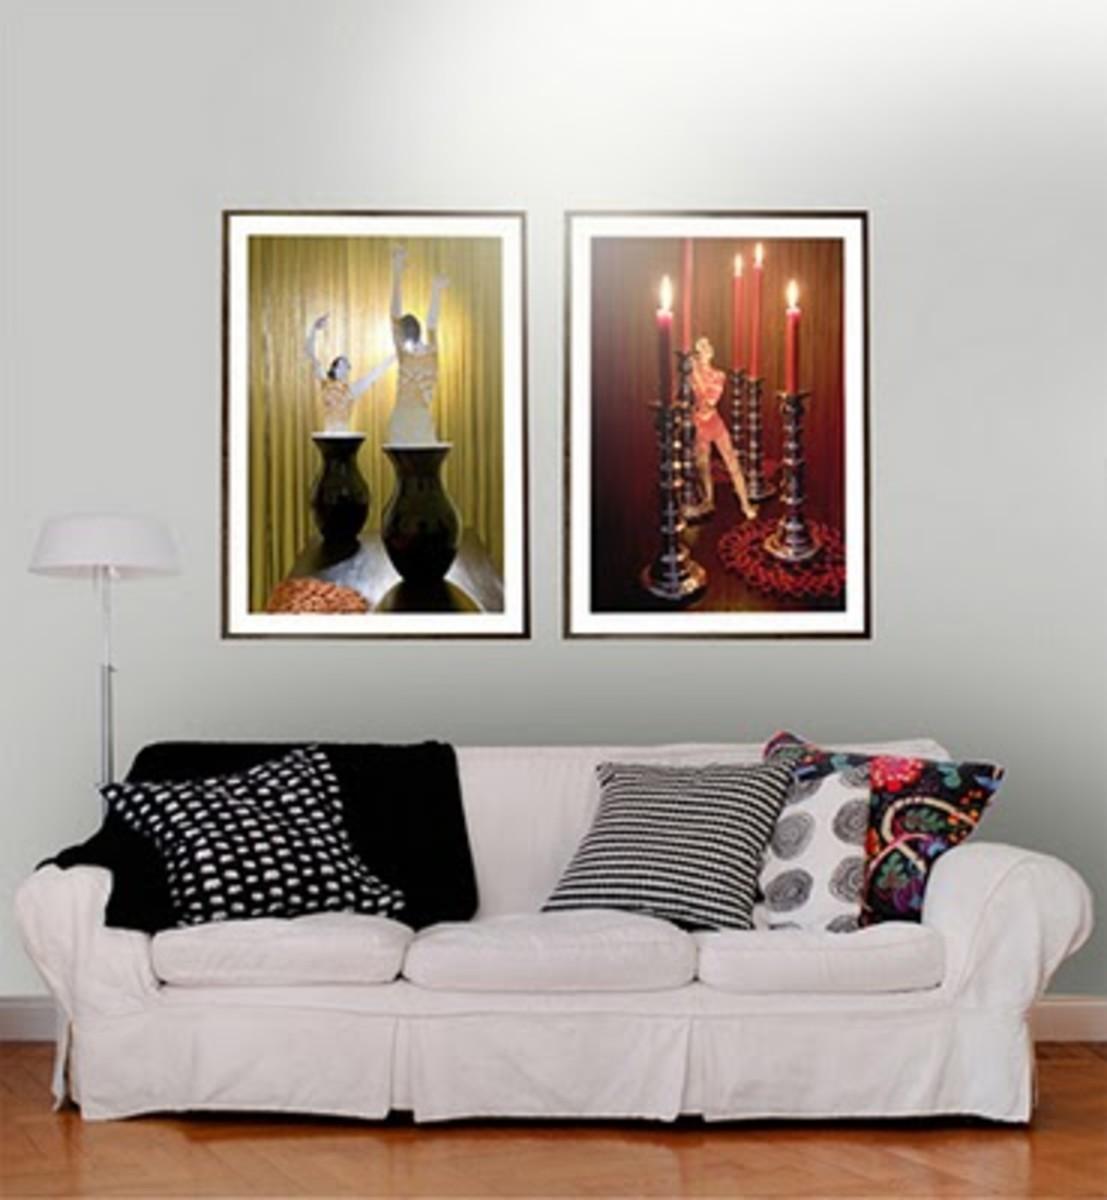 The art of hanging artwork